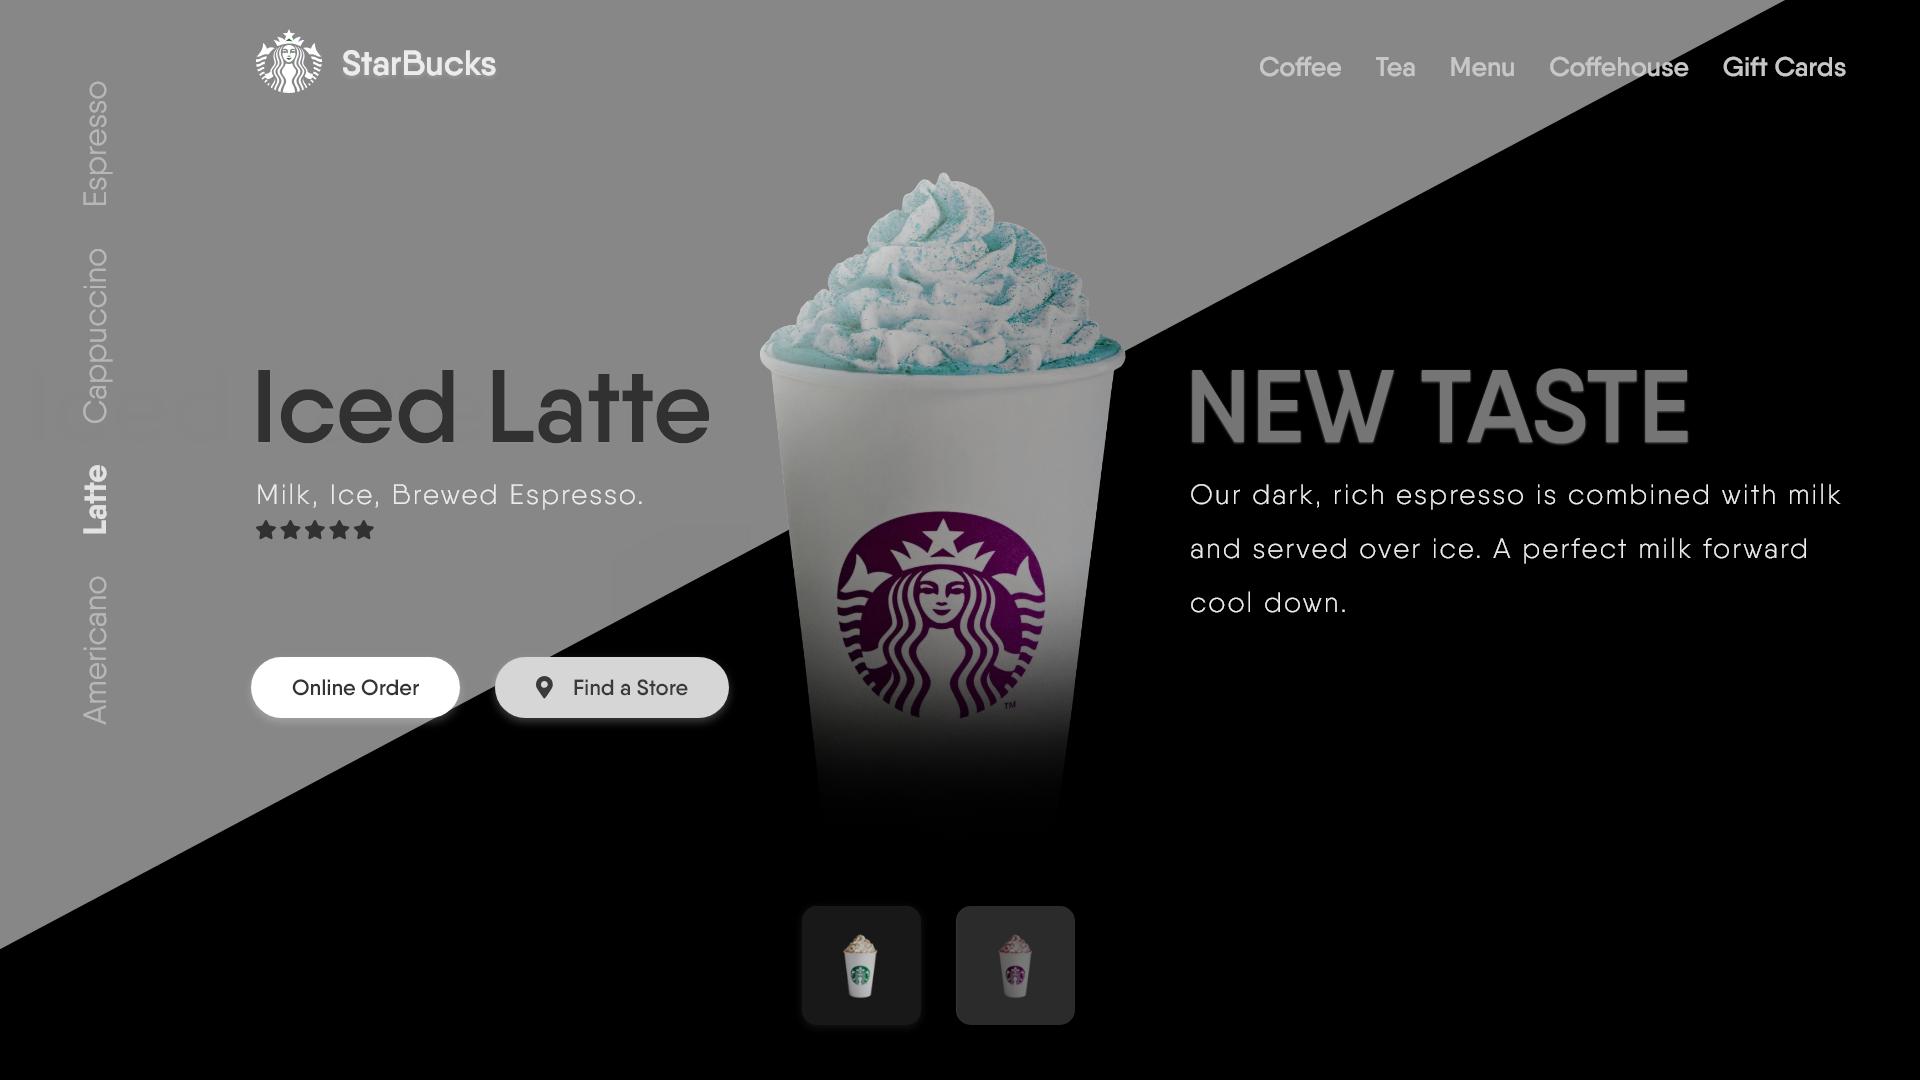 Starbucks promo